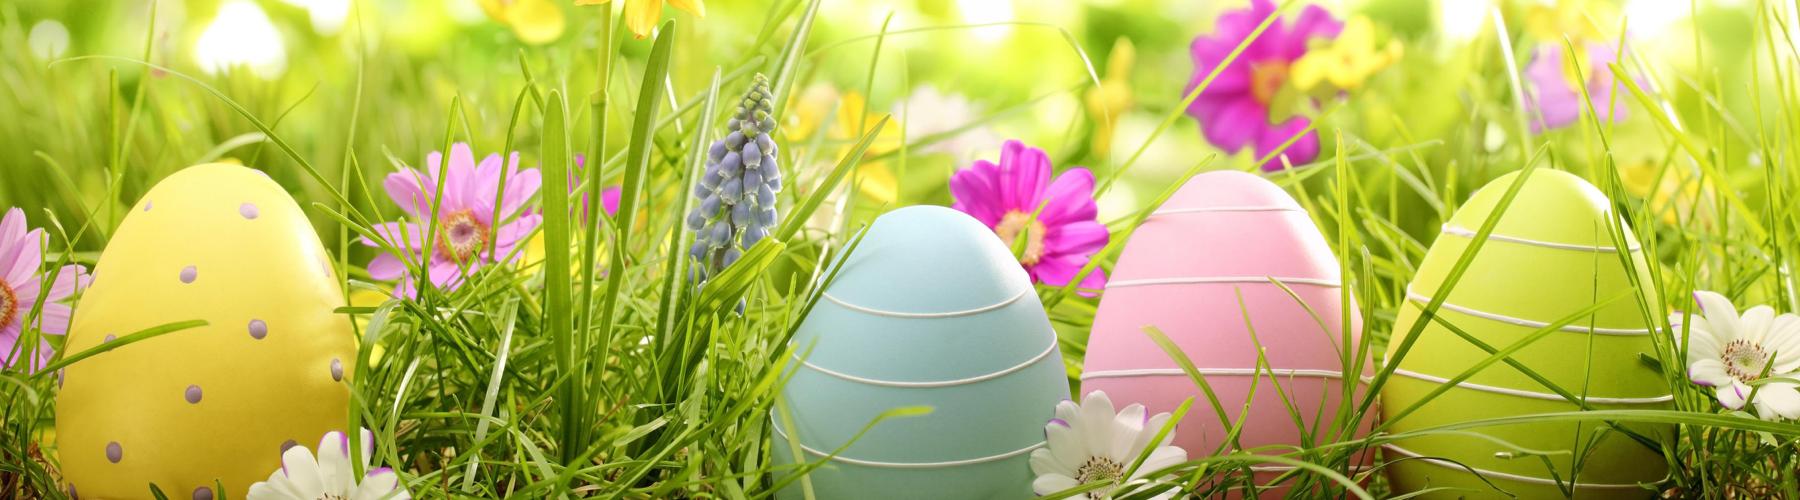 8 Creative Easter Advertisements